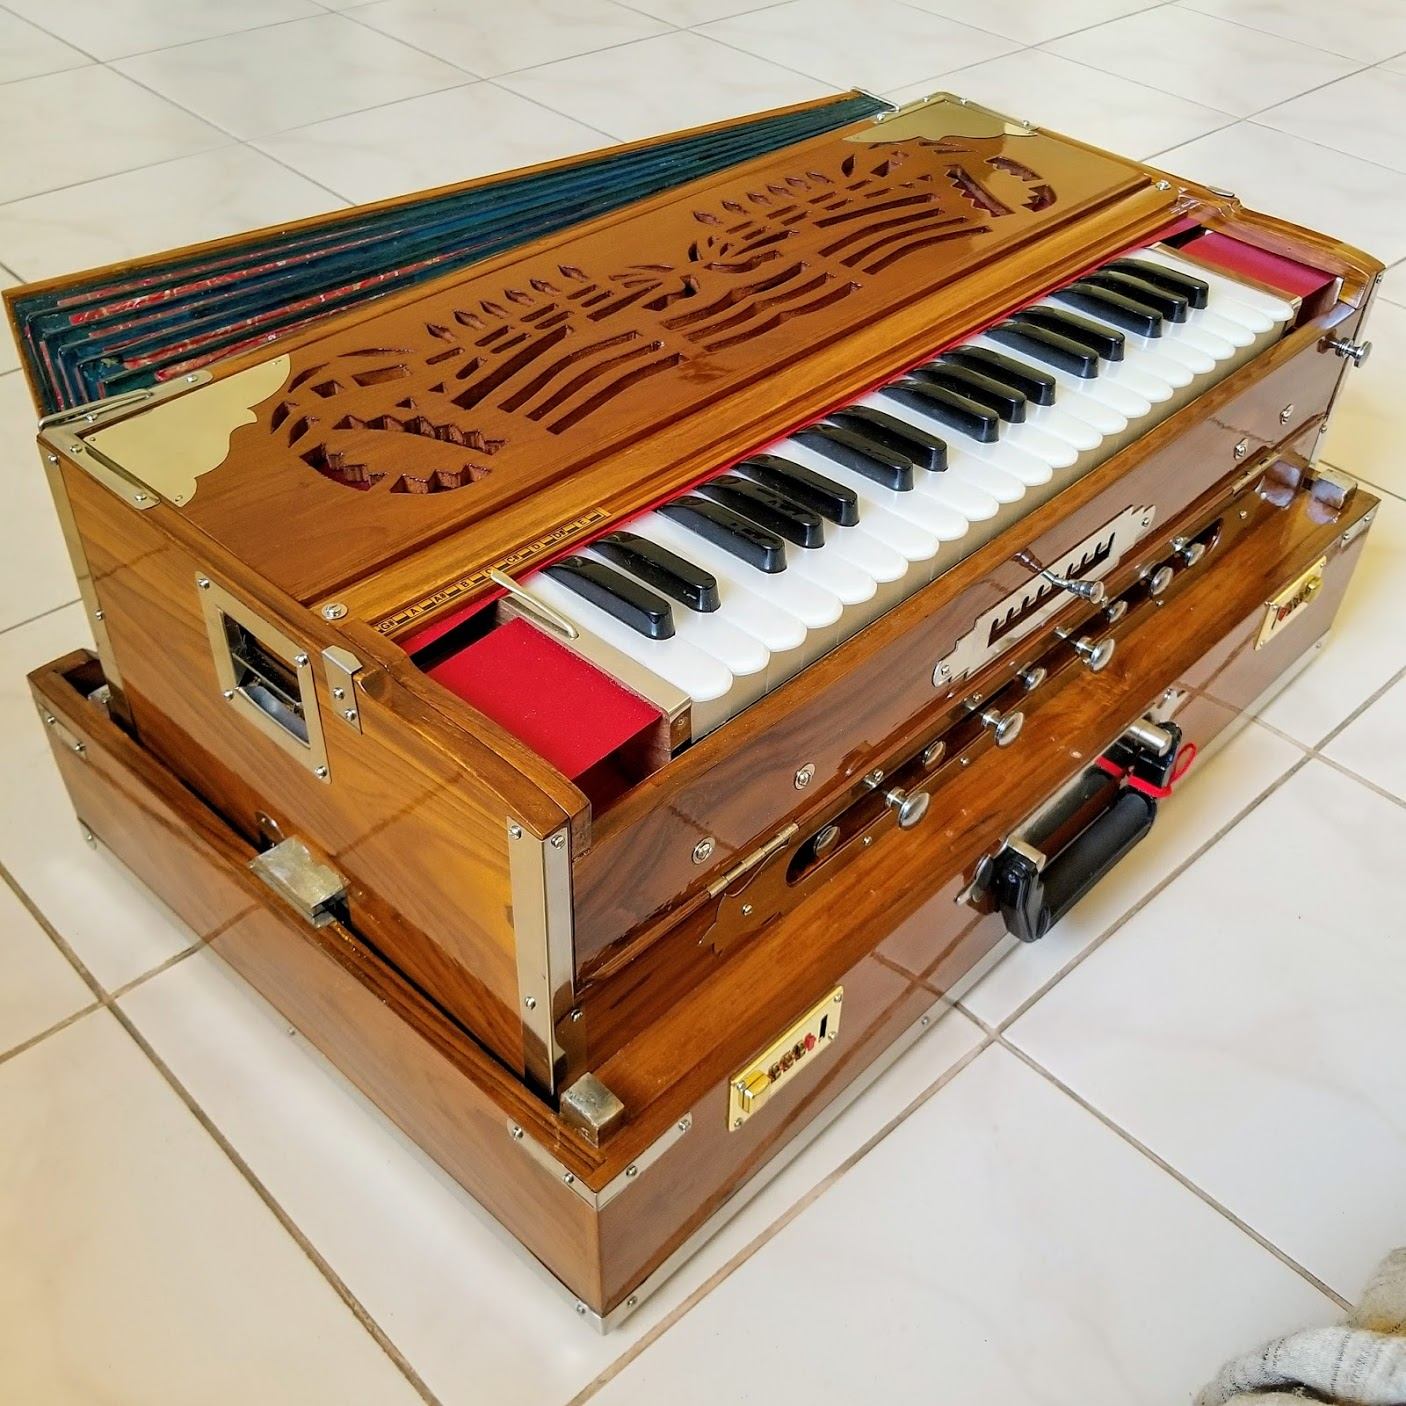 Temple harmonium - Indian reeds